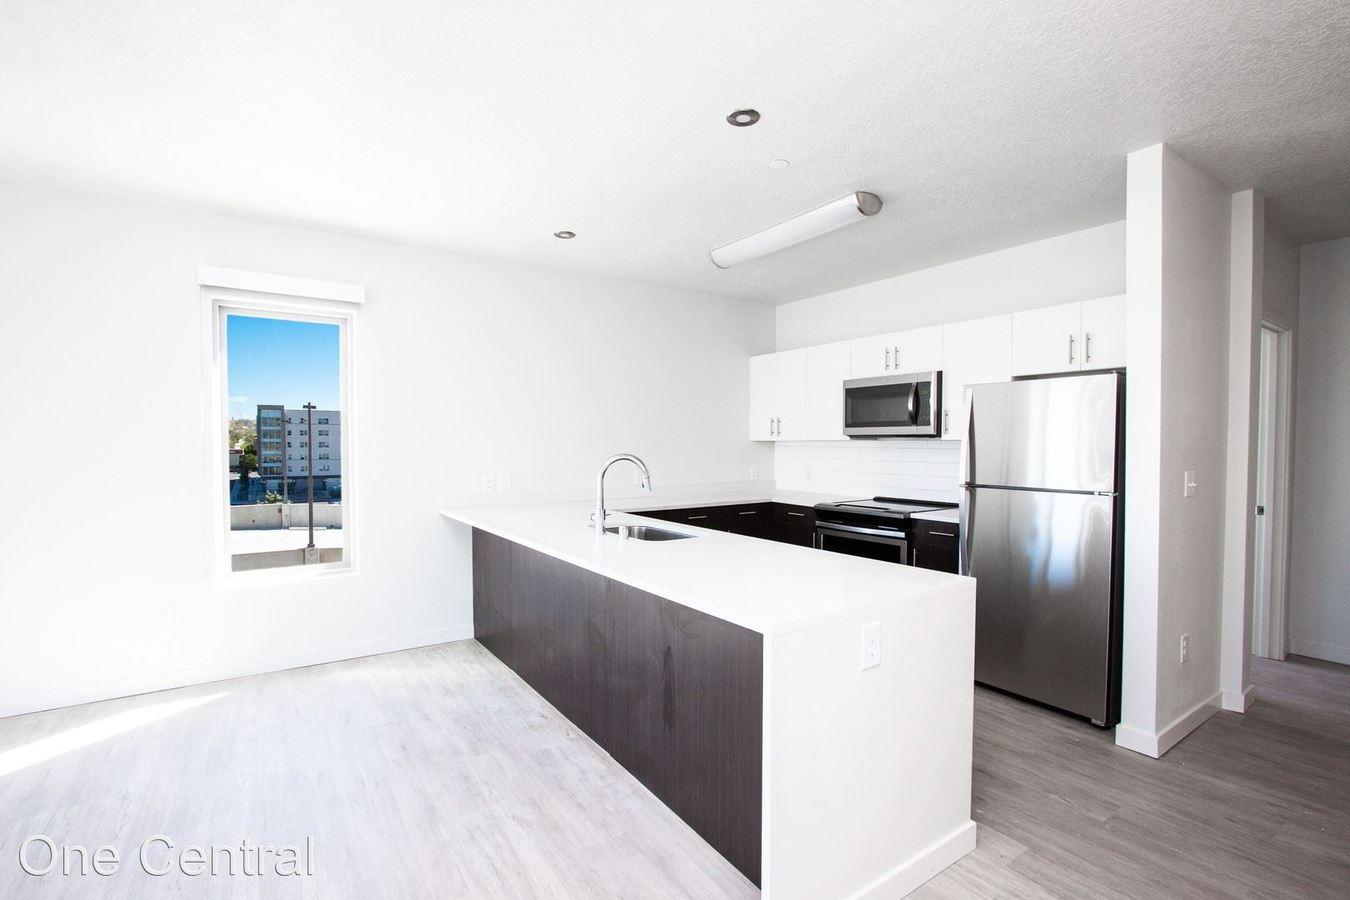 Super 1 Central Ave Nw Albuquerque Nm Apartment For Rent Interior Design Ideas Skatsoteloinfo